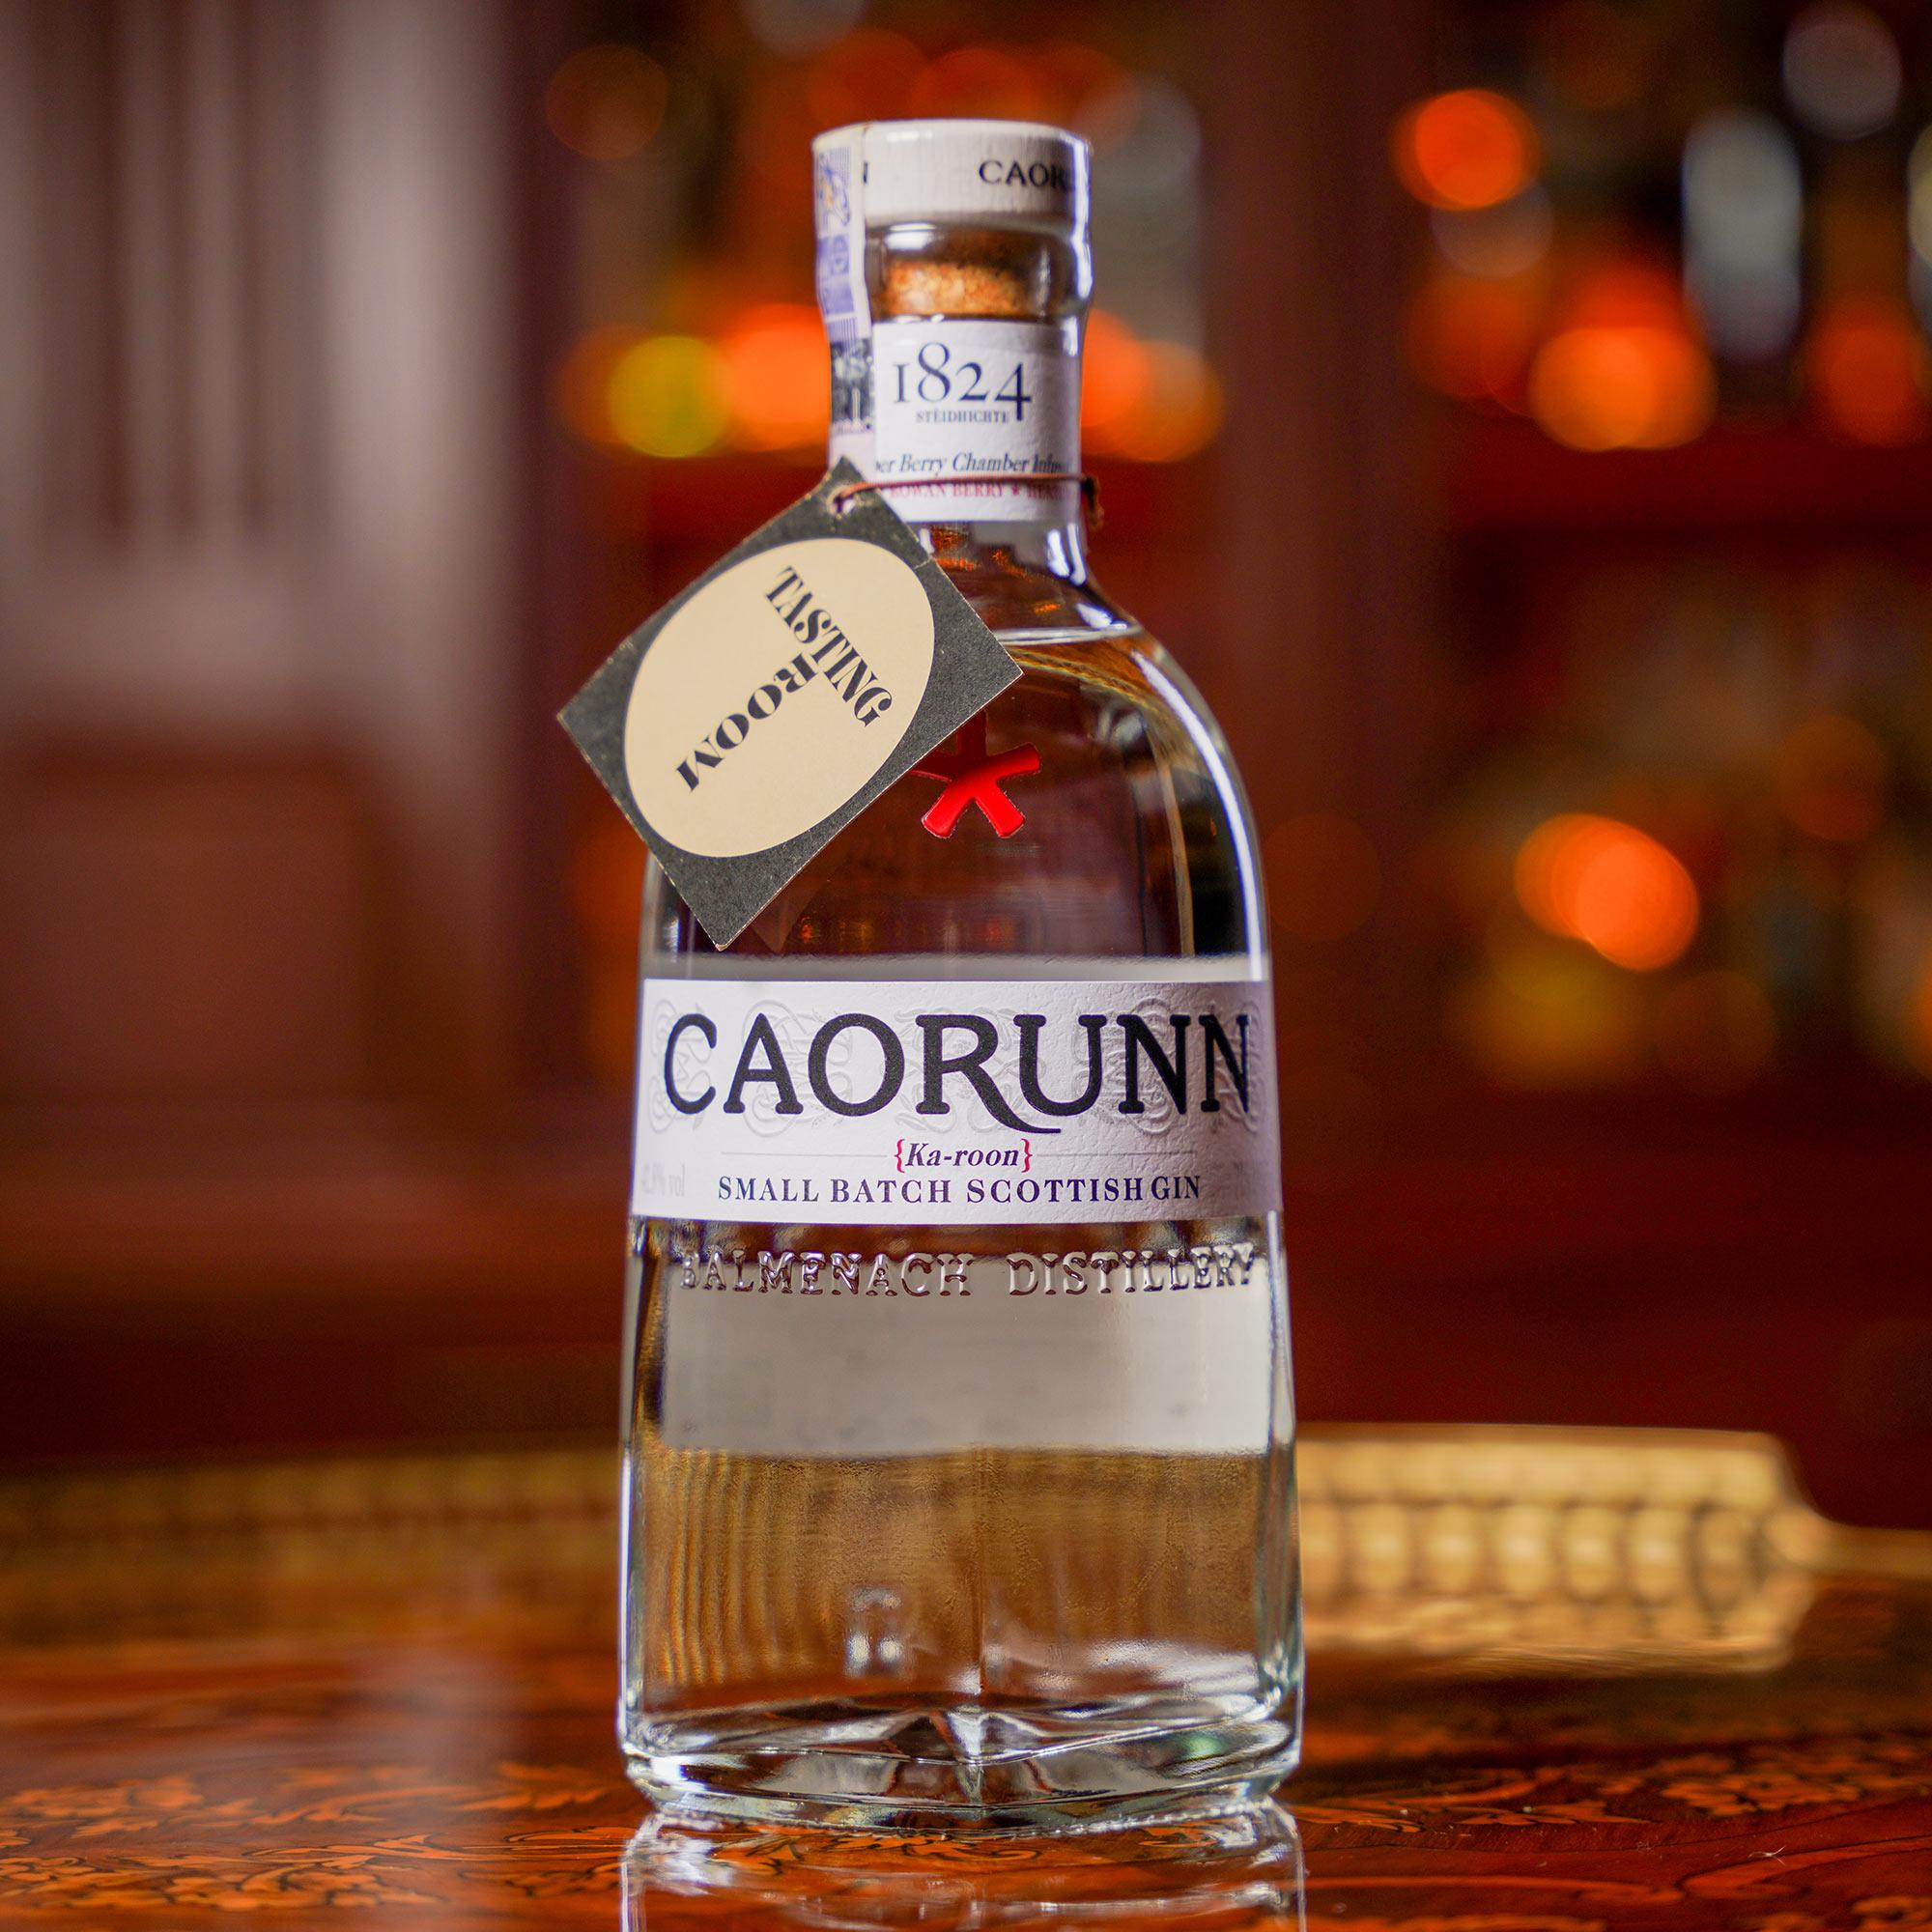 Caorunn Small Batch Scottish Gin /Карун или Каруун Смол Бач Шотландски Джин